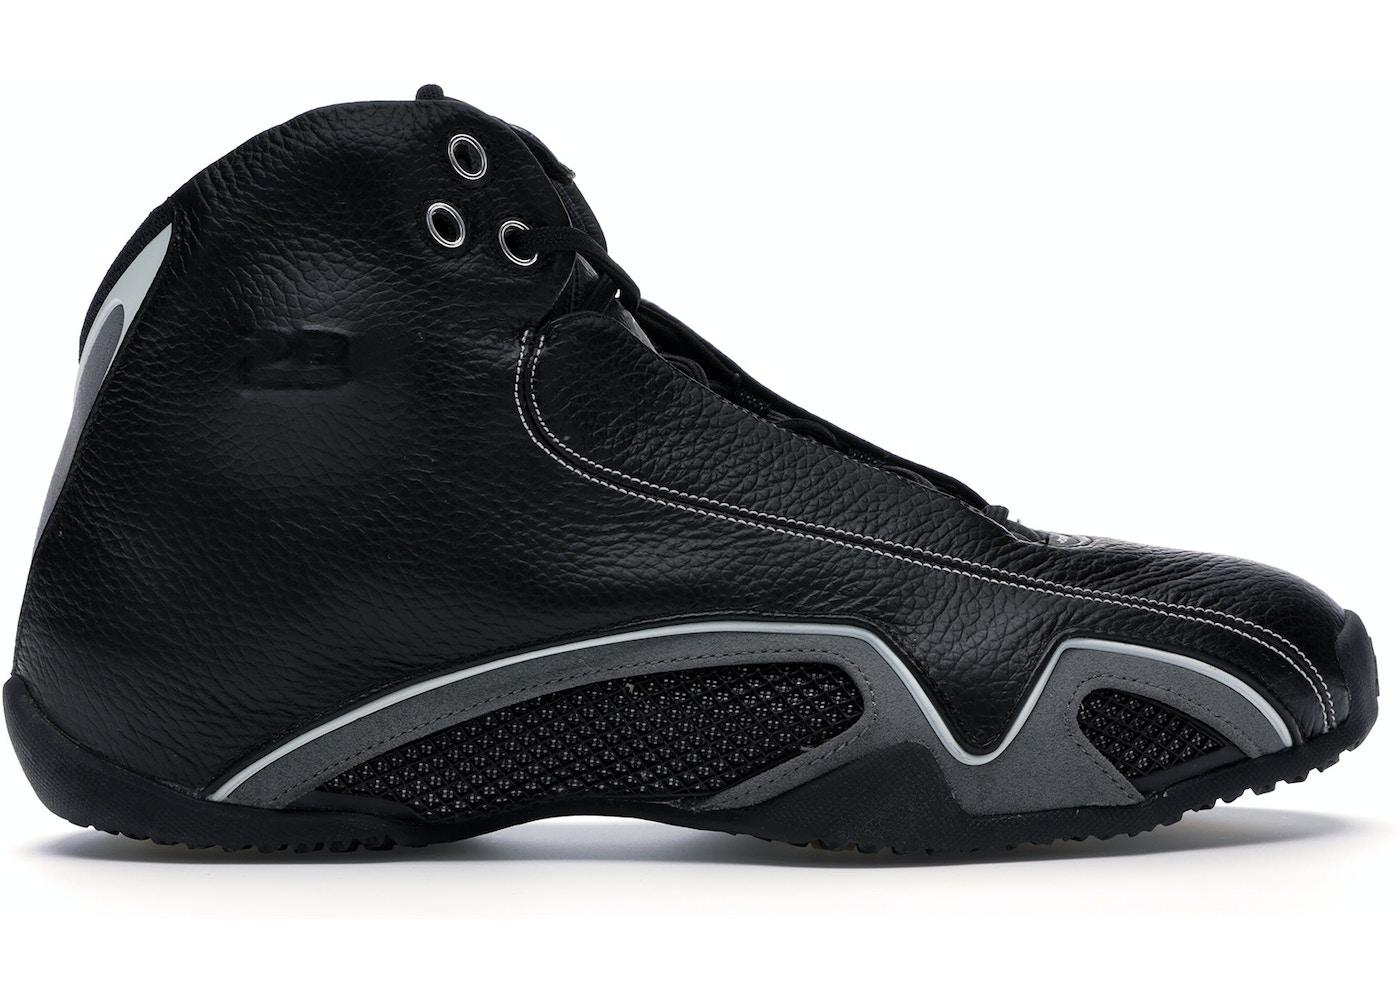 Buy Air Jordan 21 Size 14 Shoes   Deadstock Sneakers a08e3b343